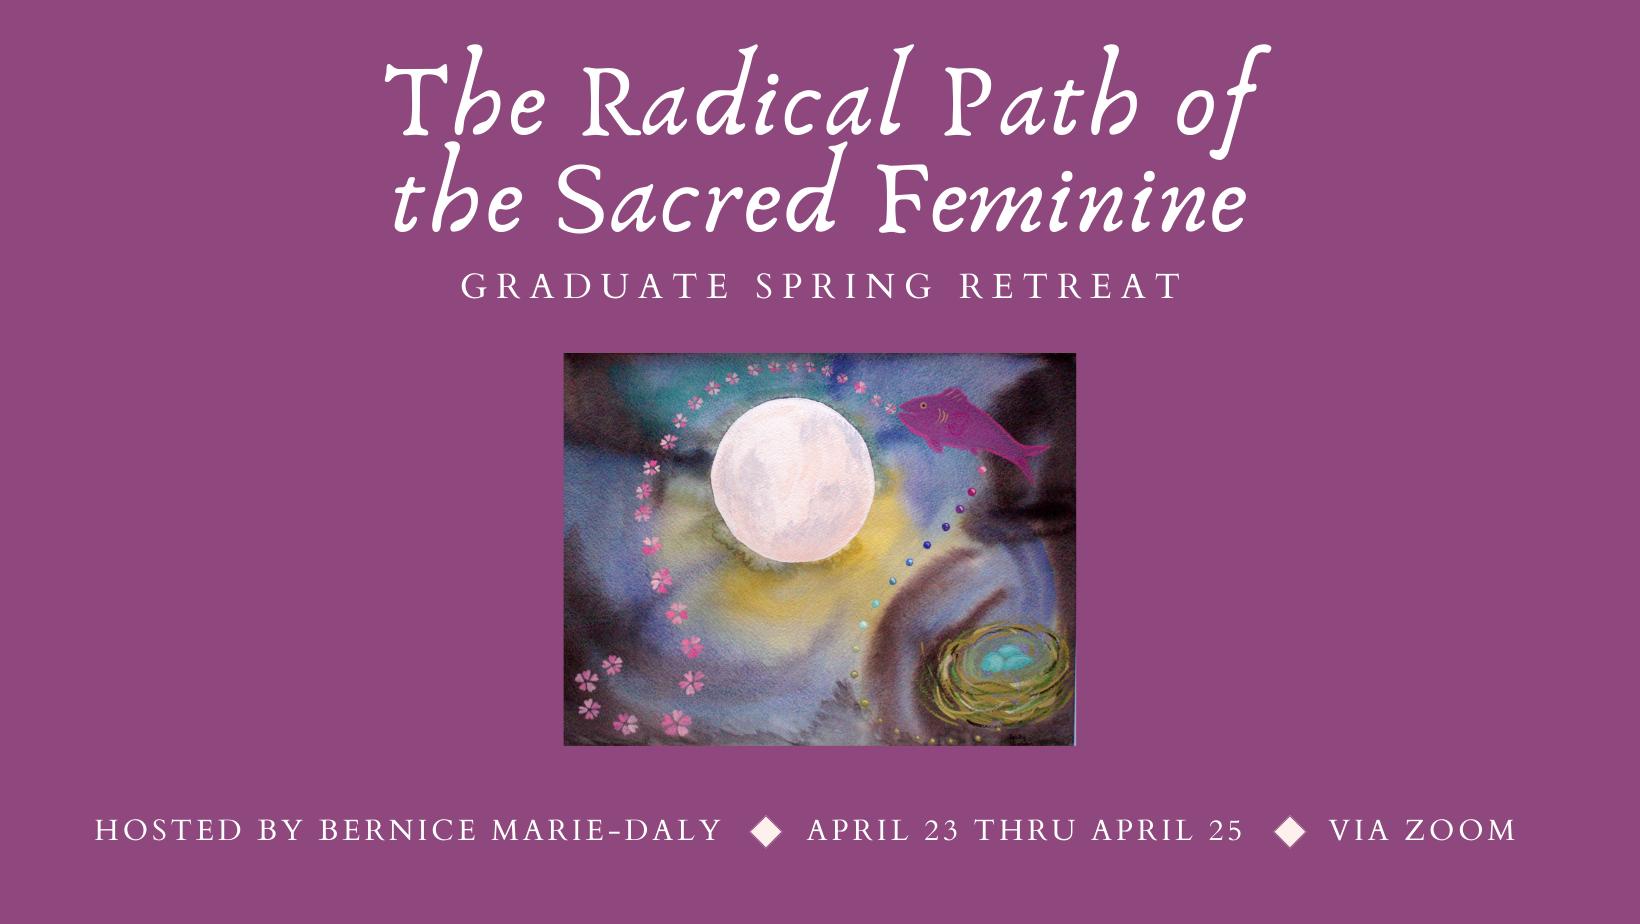 Graduate Spring Retreat: The Radical Path of the Sacred Feminine image